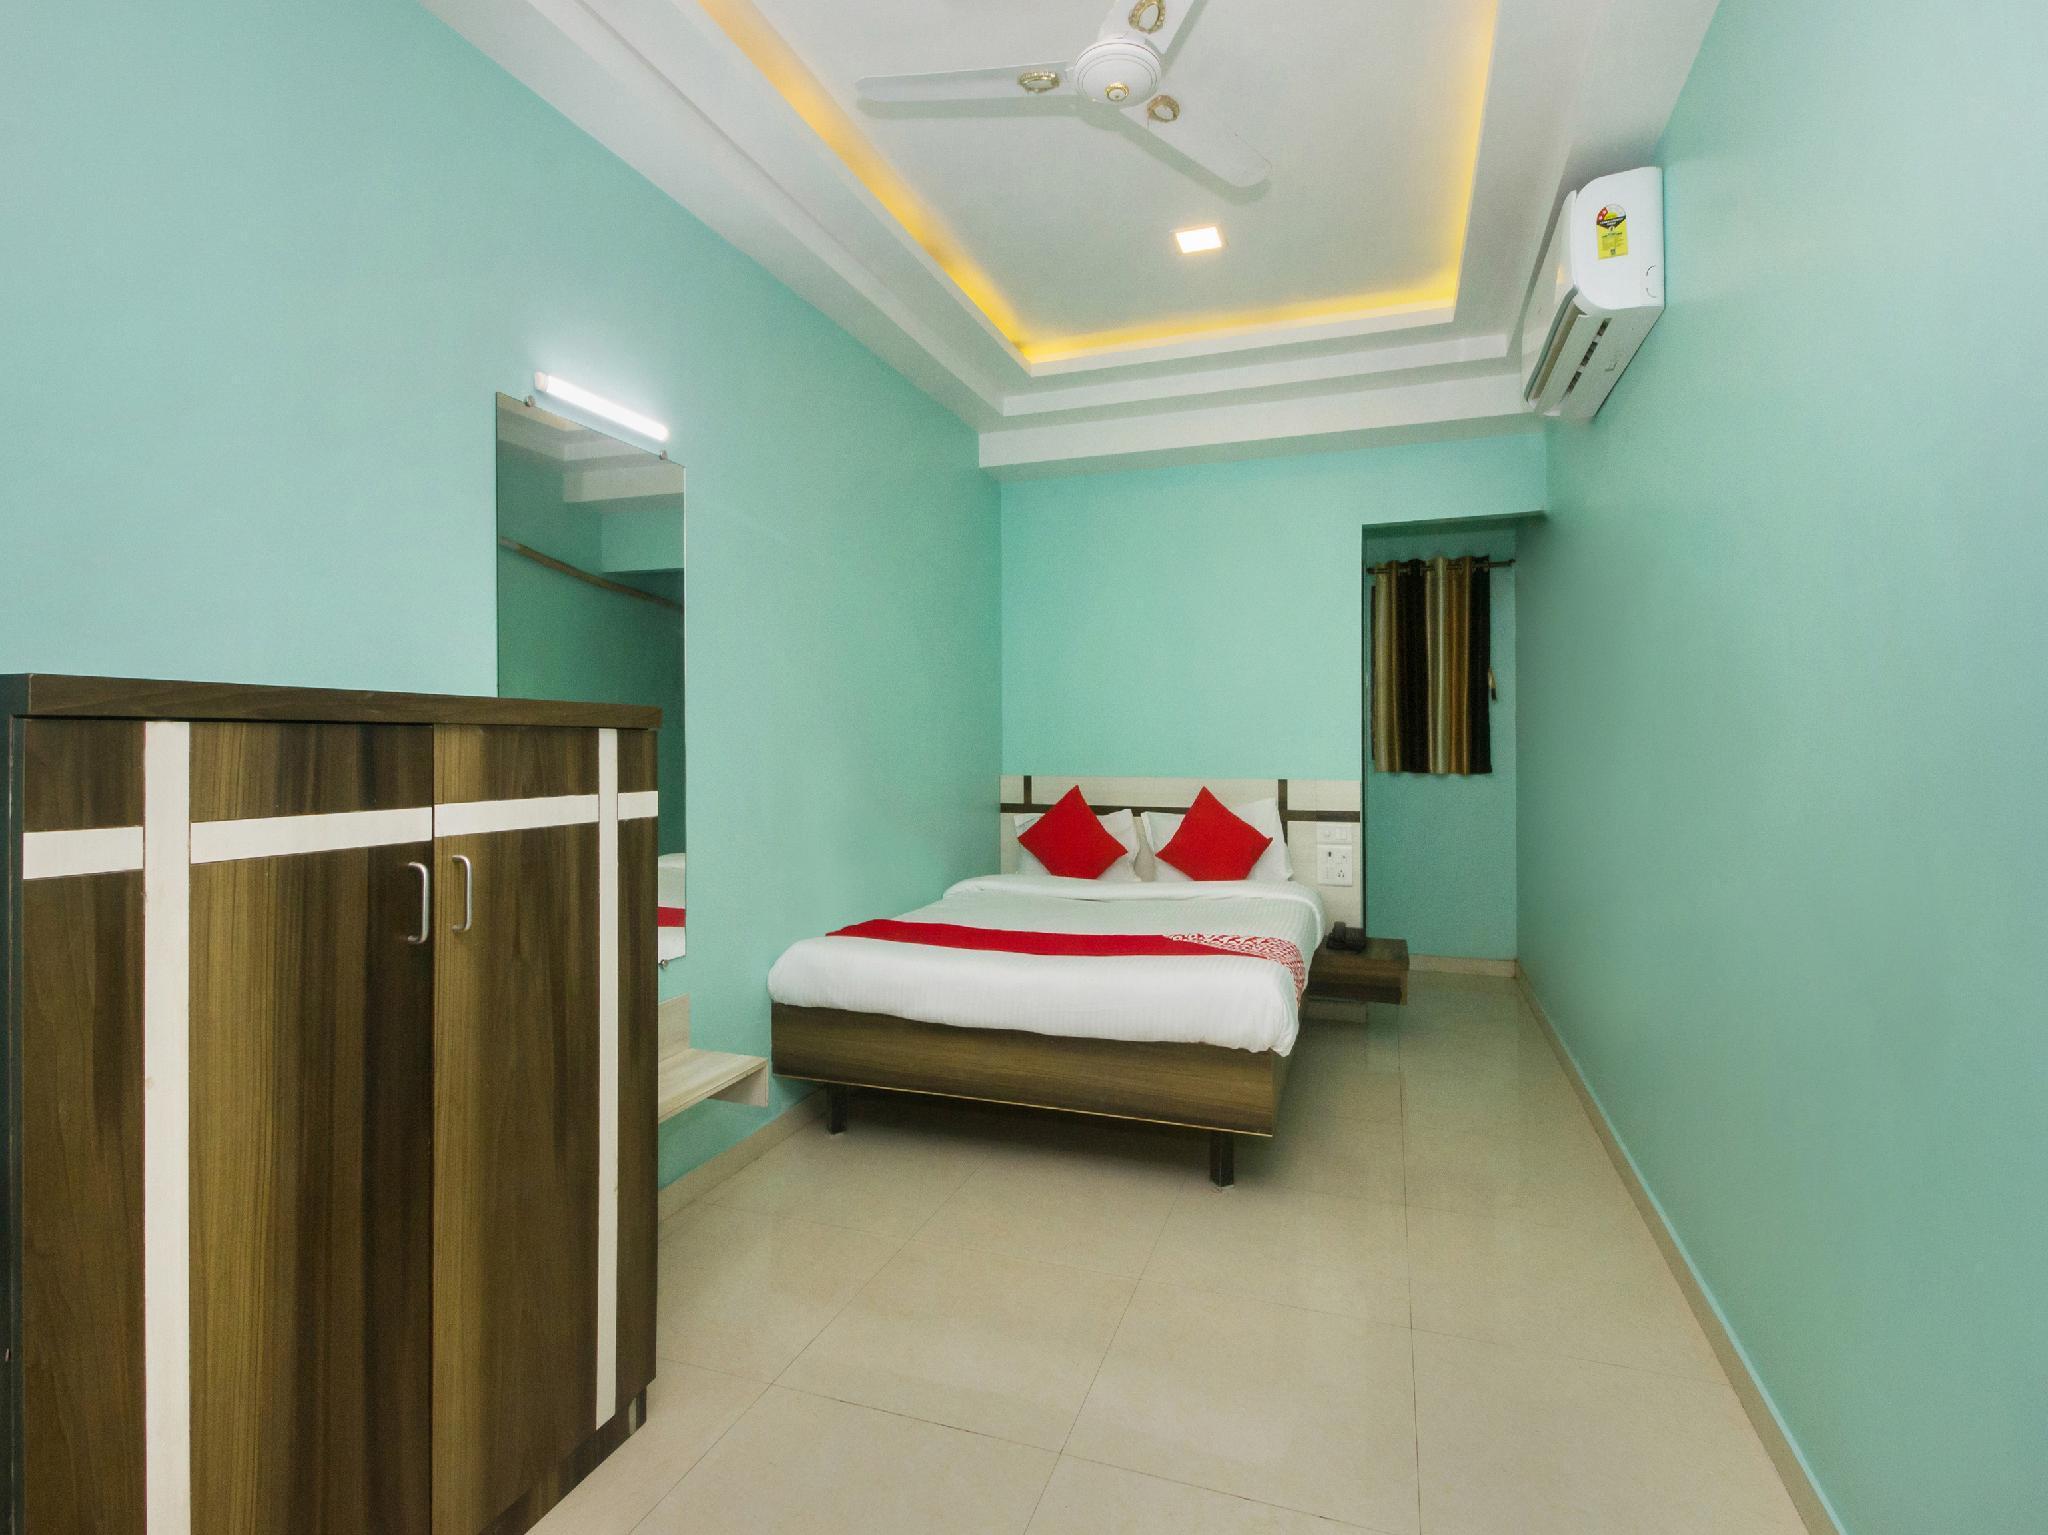 OYO 22918 Hotel Sadanand Mourya Lodging And Boarding